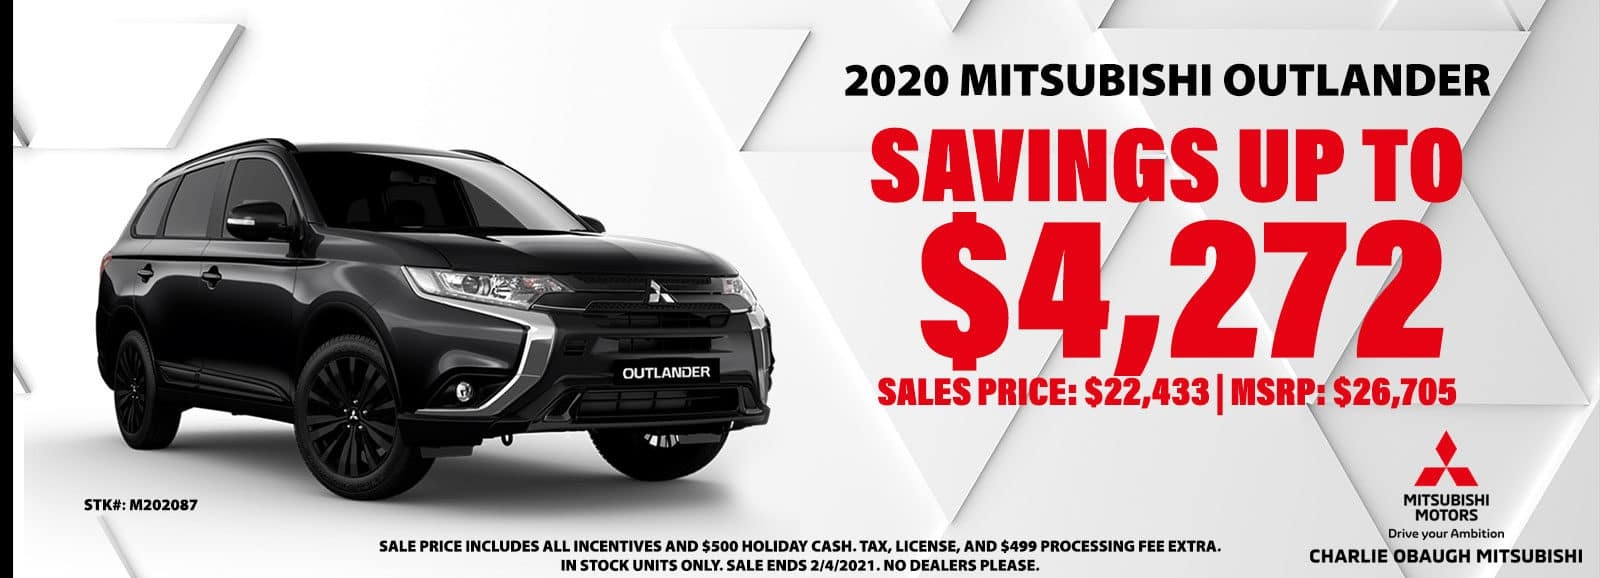 CO-2020-Mitsubishi-Outlander-Jan